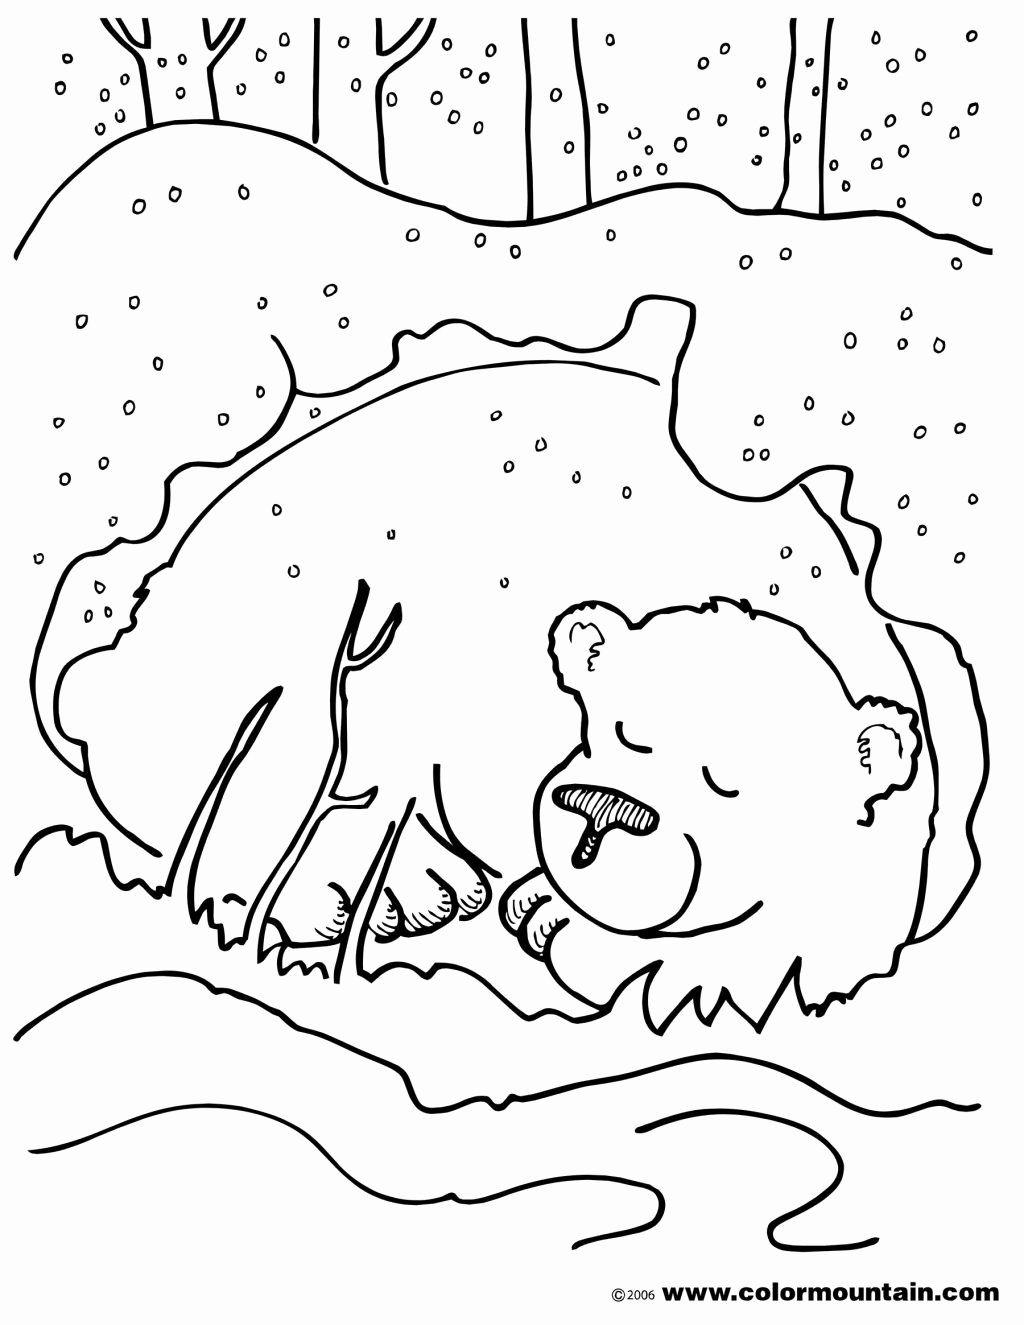 Coloring Pages Hibernating Animals Unique Worksheet Ideas Hibernation Worksheets Picture Bear Coloring Pages Coloring Pages Winter Animal Coloring Pages [ 1325 x 1024 Pixel ]